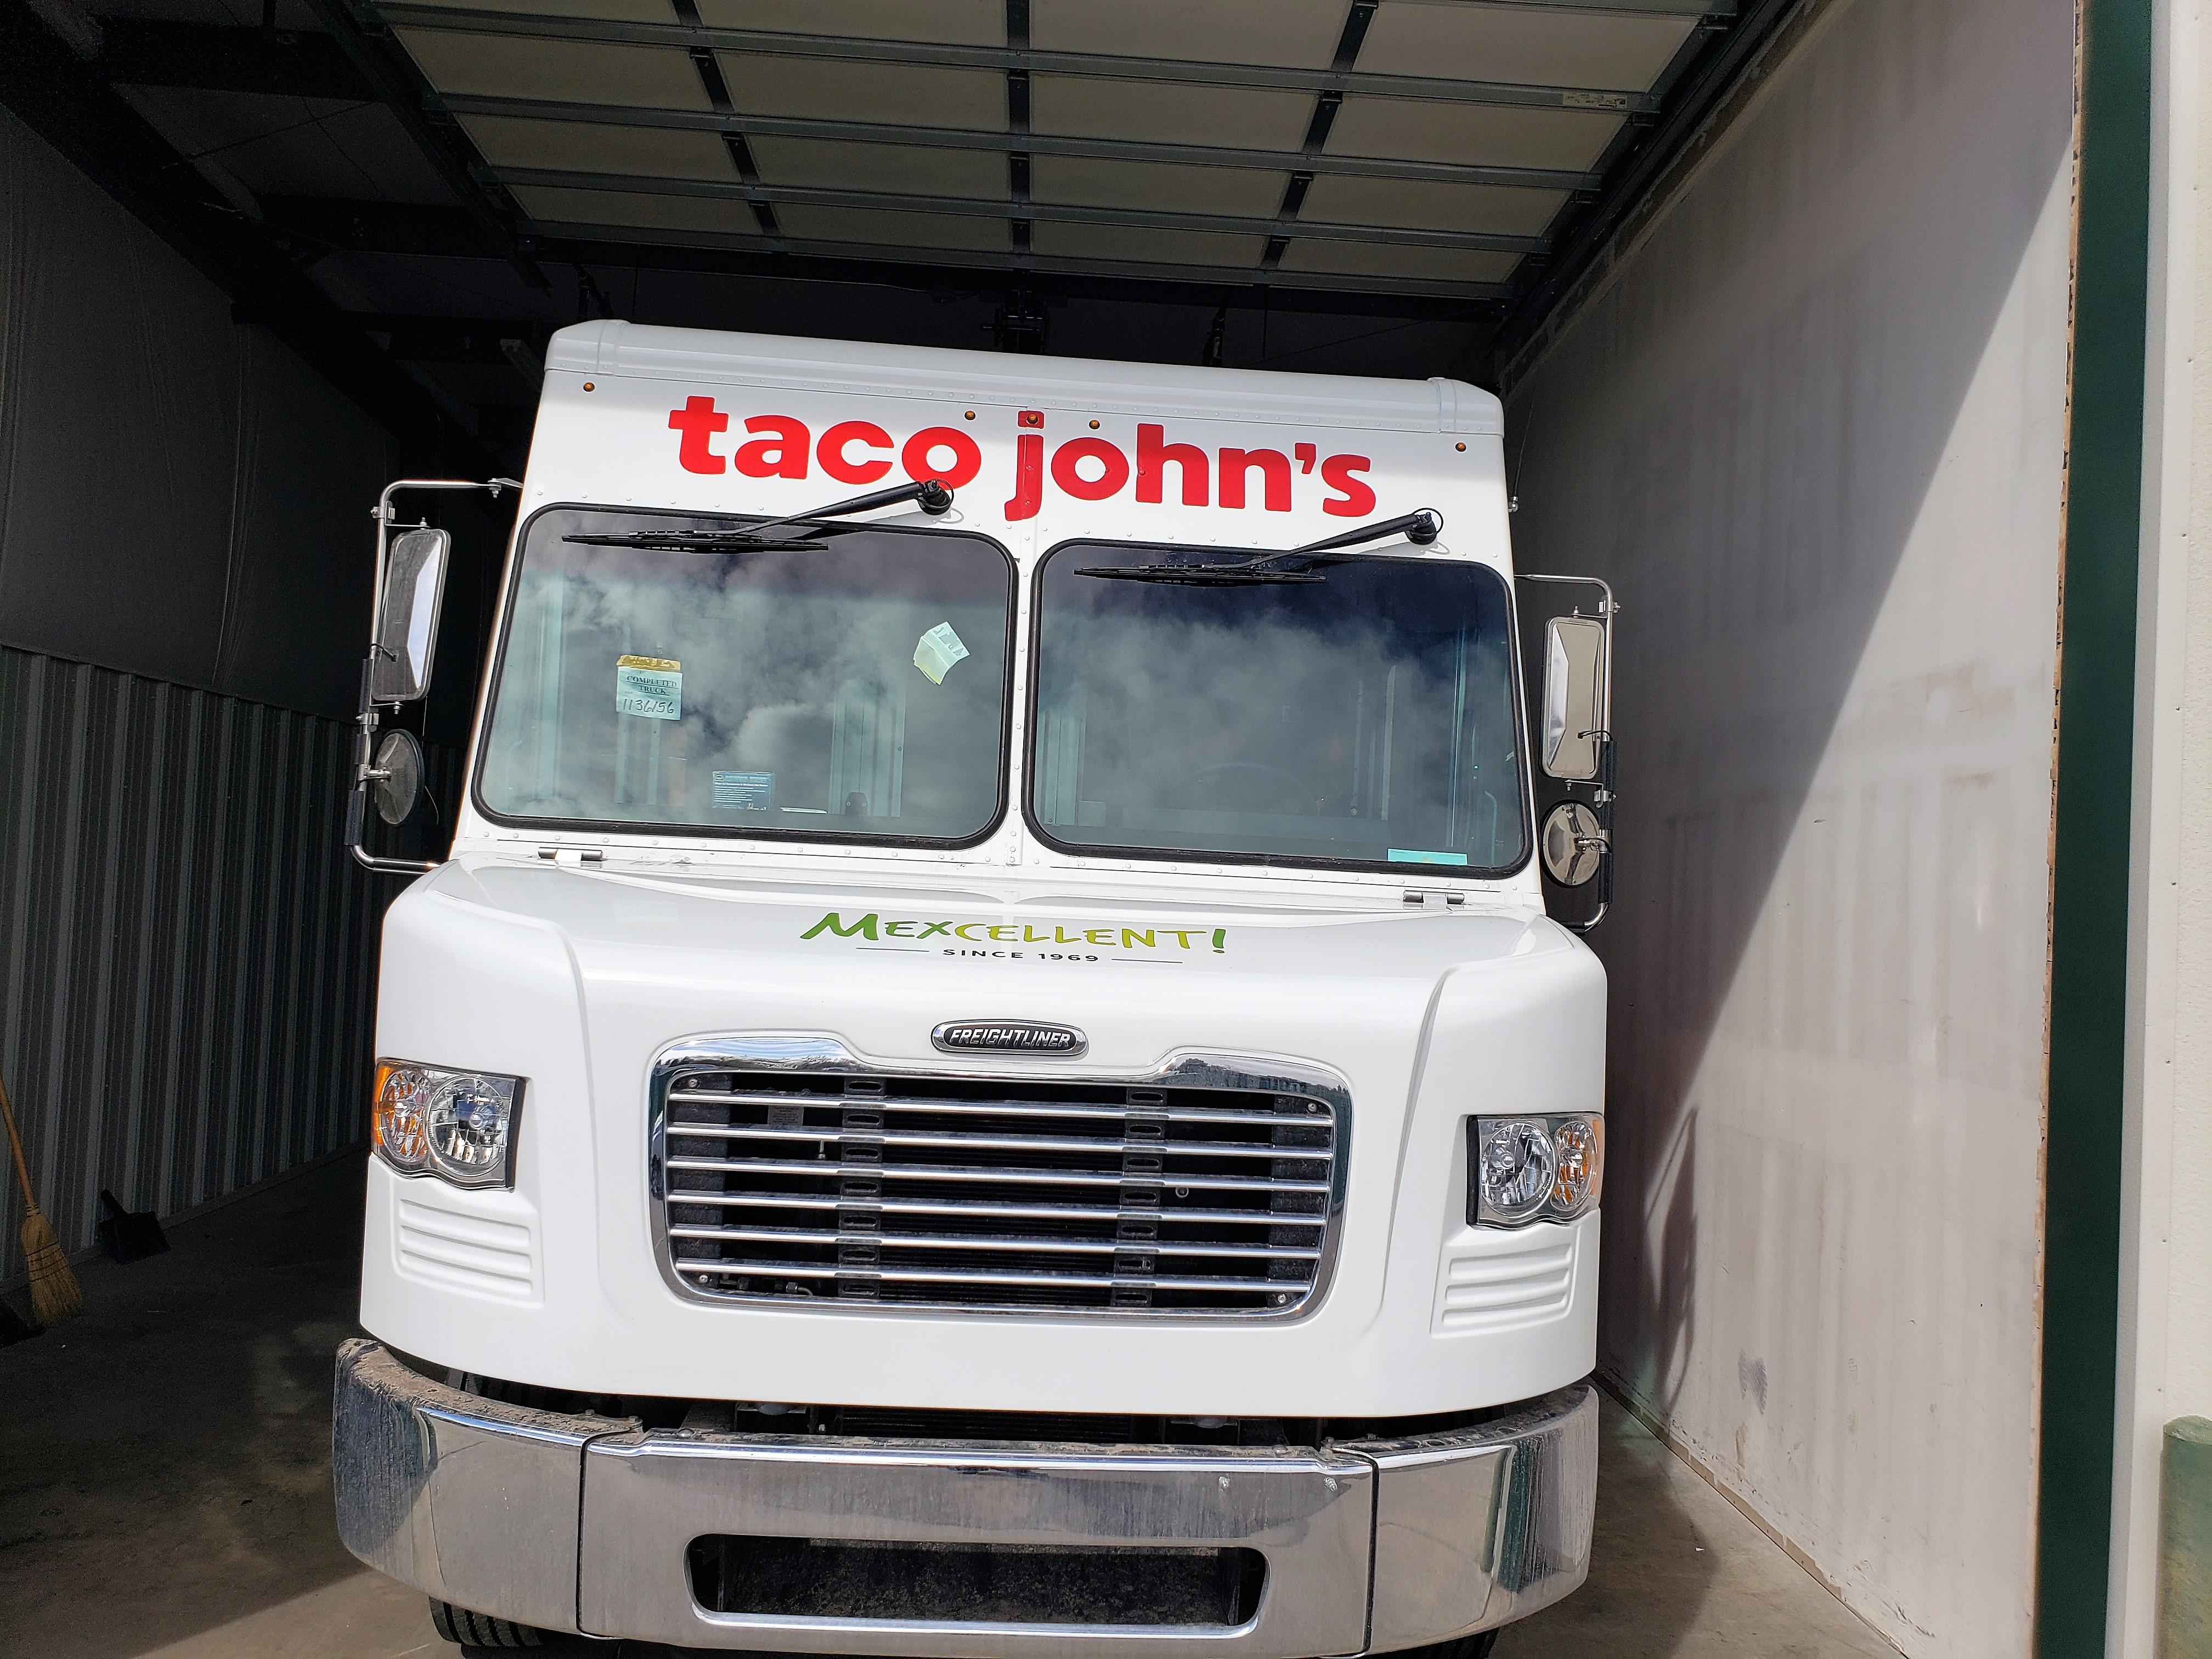 Taco John S Deploys Food Truck To Introduce New Look Food